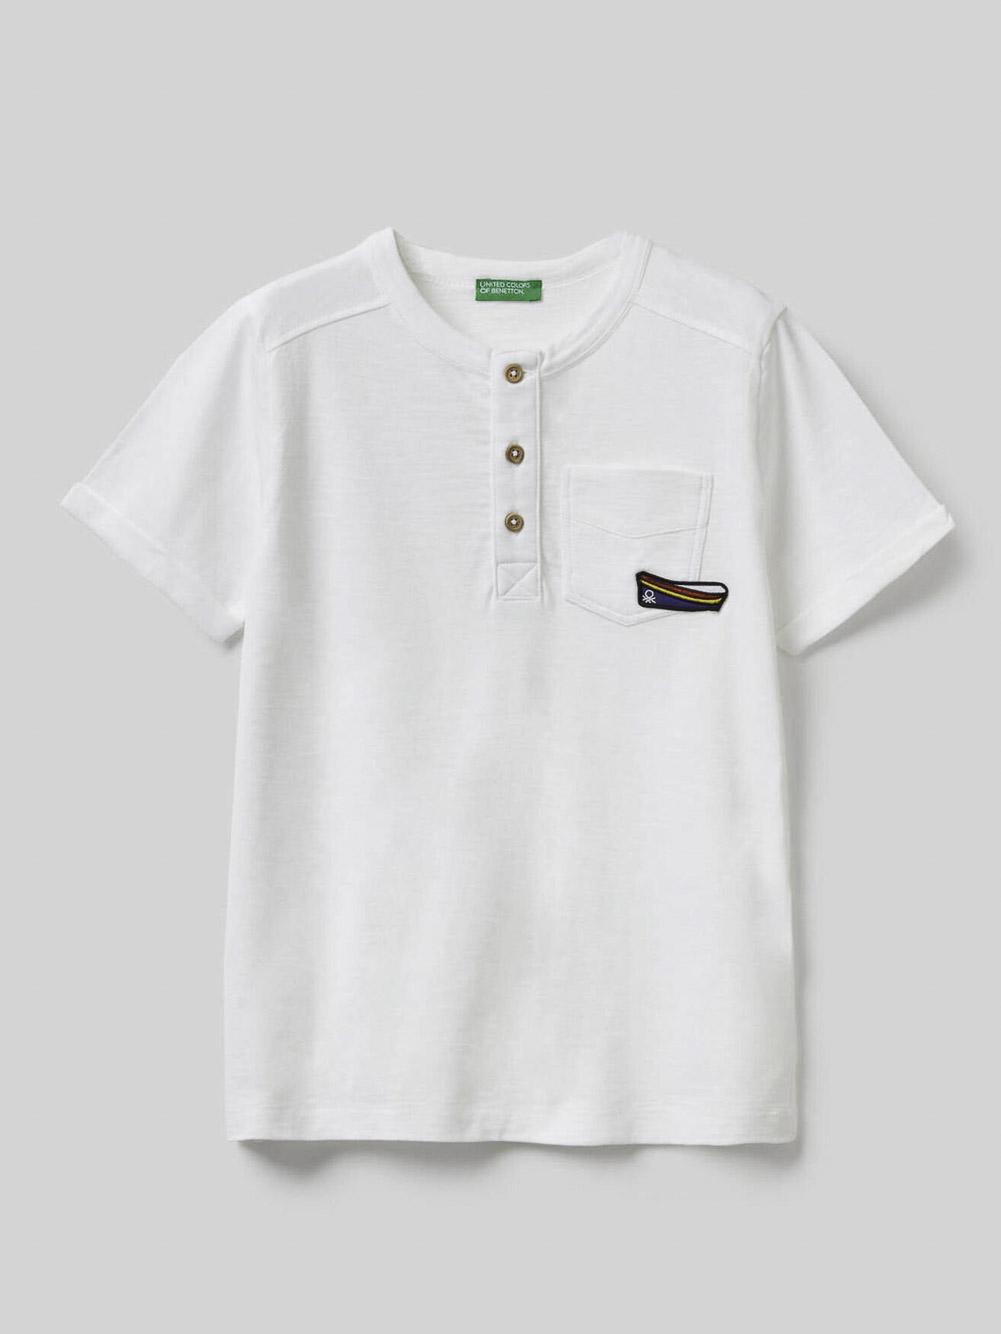 012 BENETTON Μπλούζα t-shirt 3BVXC7019 20P101